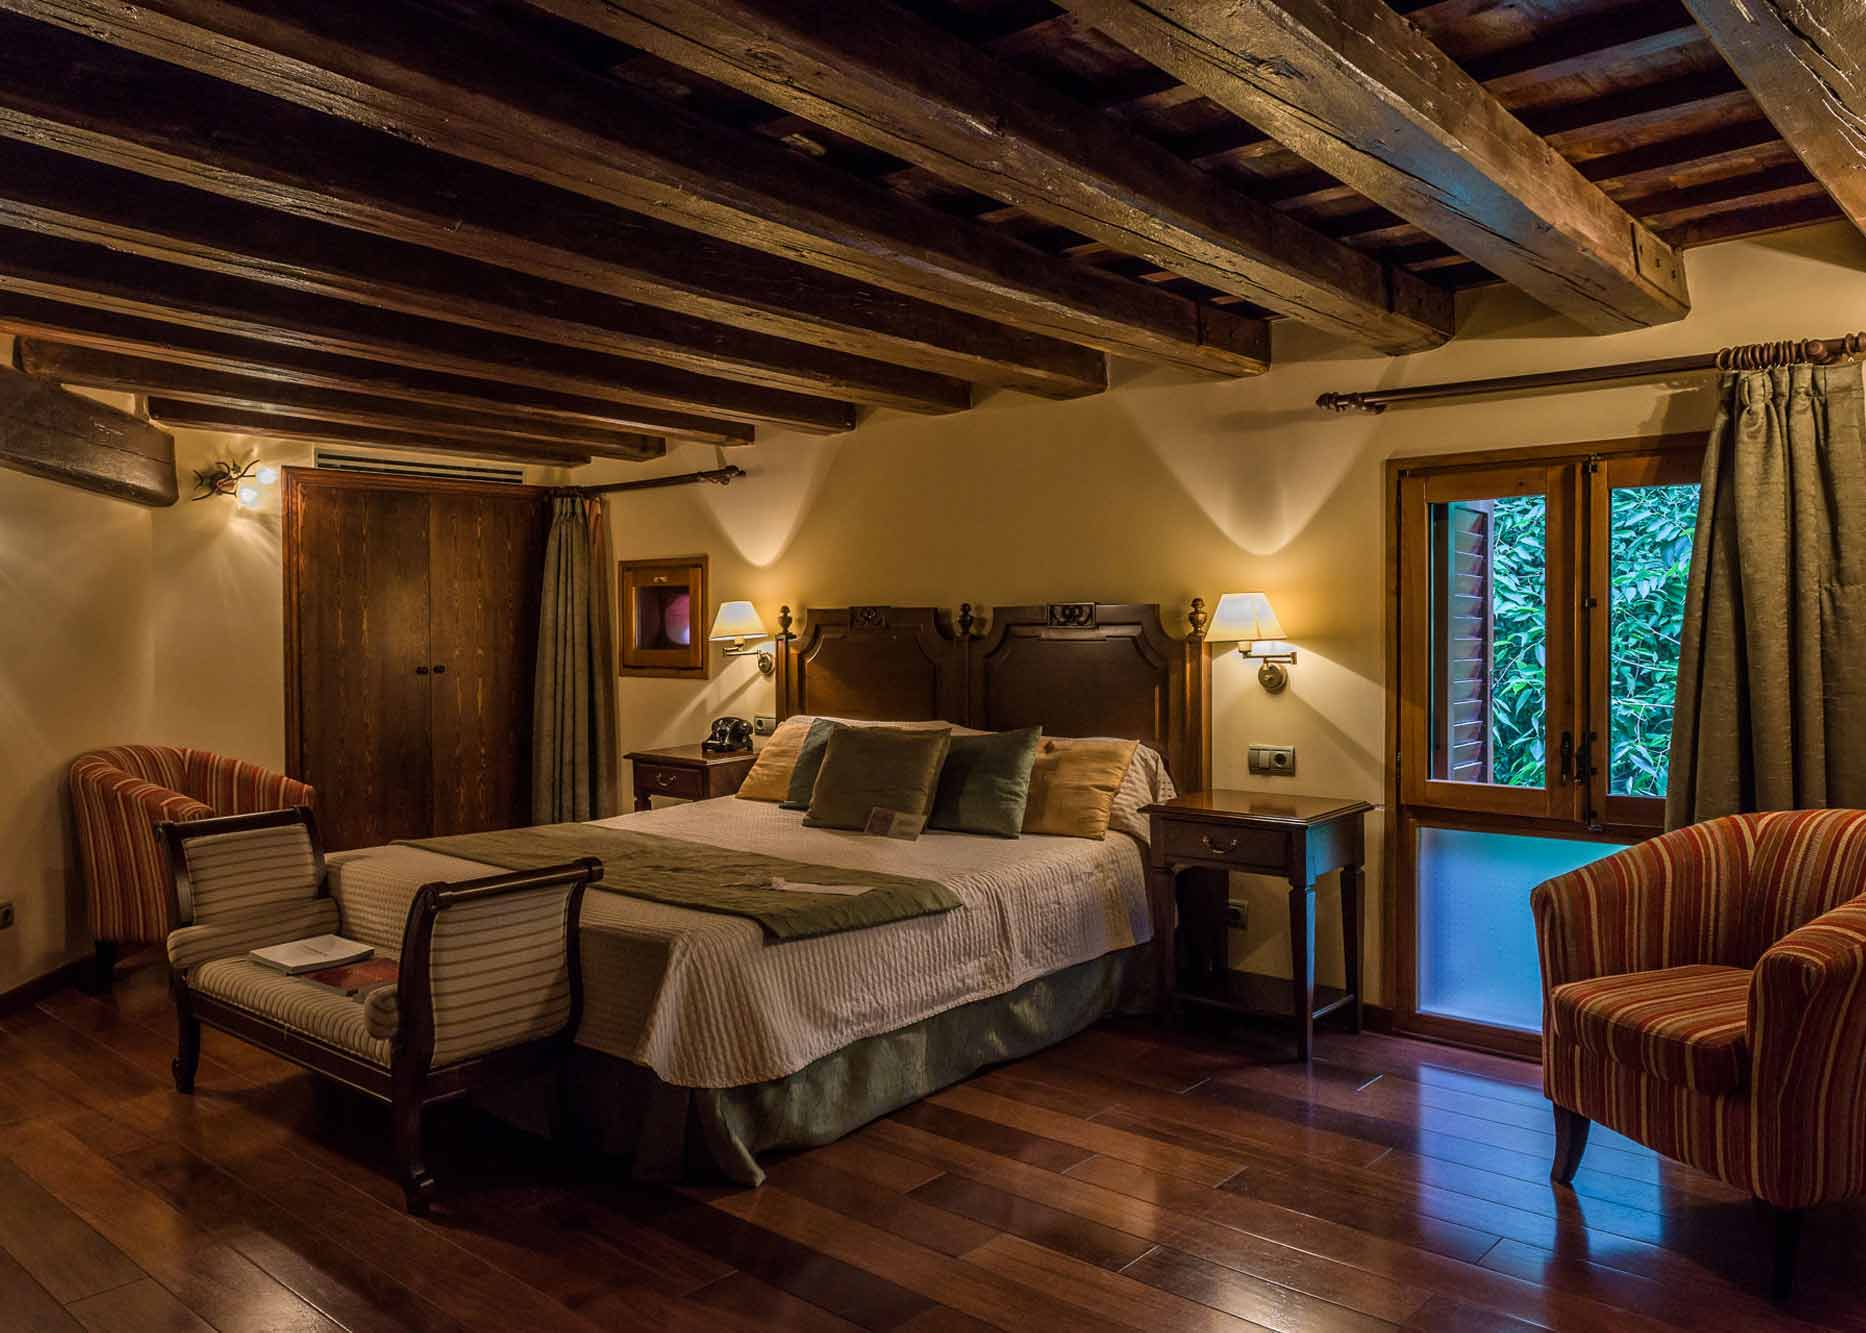 Hotel Villa Retiro 5 estrellas stars etoiles luxury luxe habitación doble double room